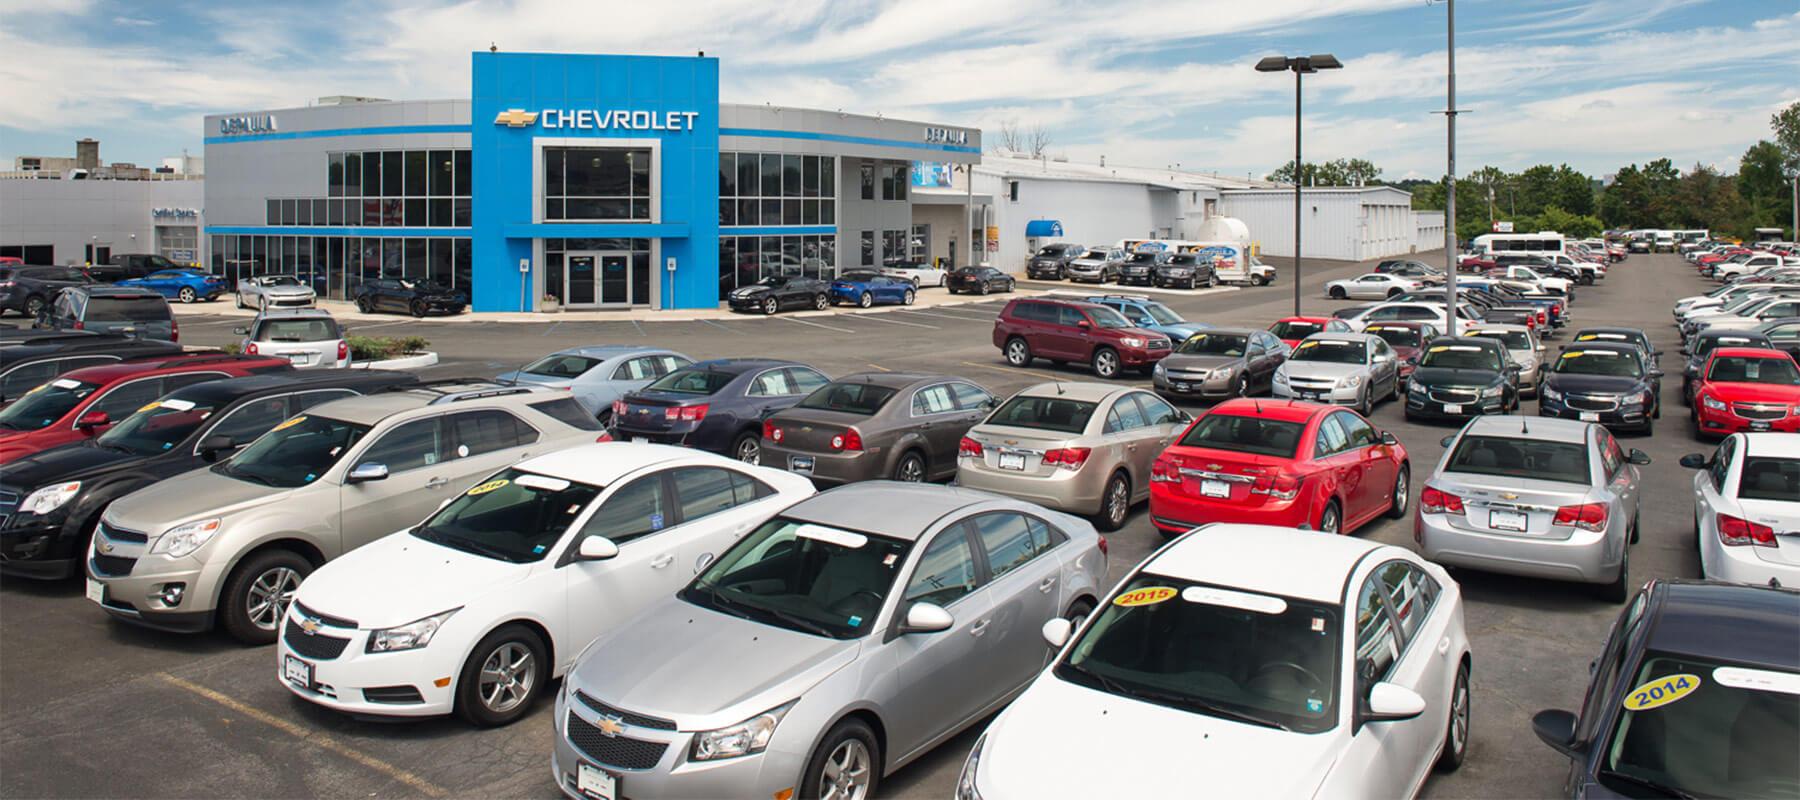 Used Car Dealership >> Used Cars Trucks Suvs For Sale Depaula Chevrolet